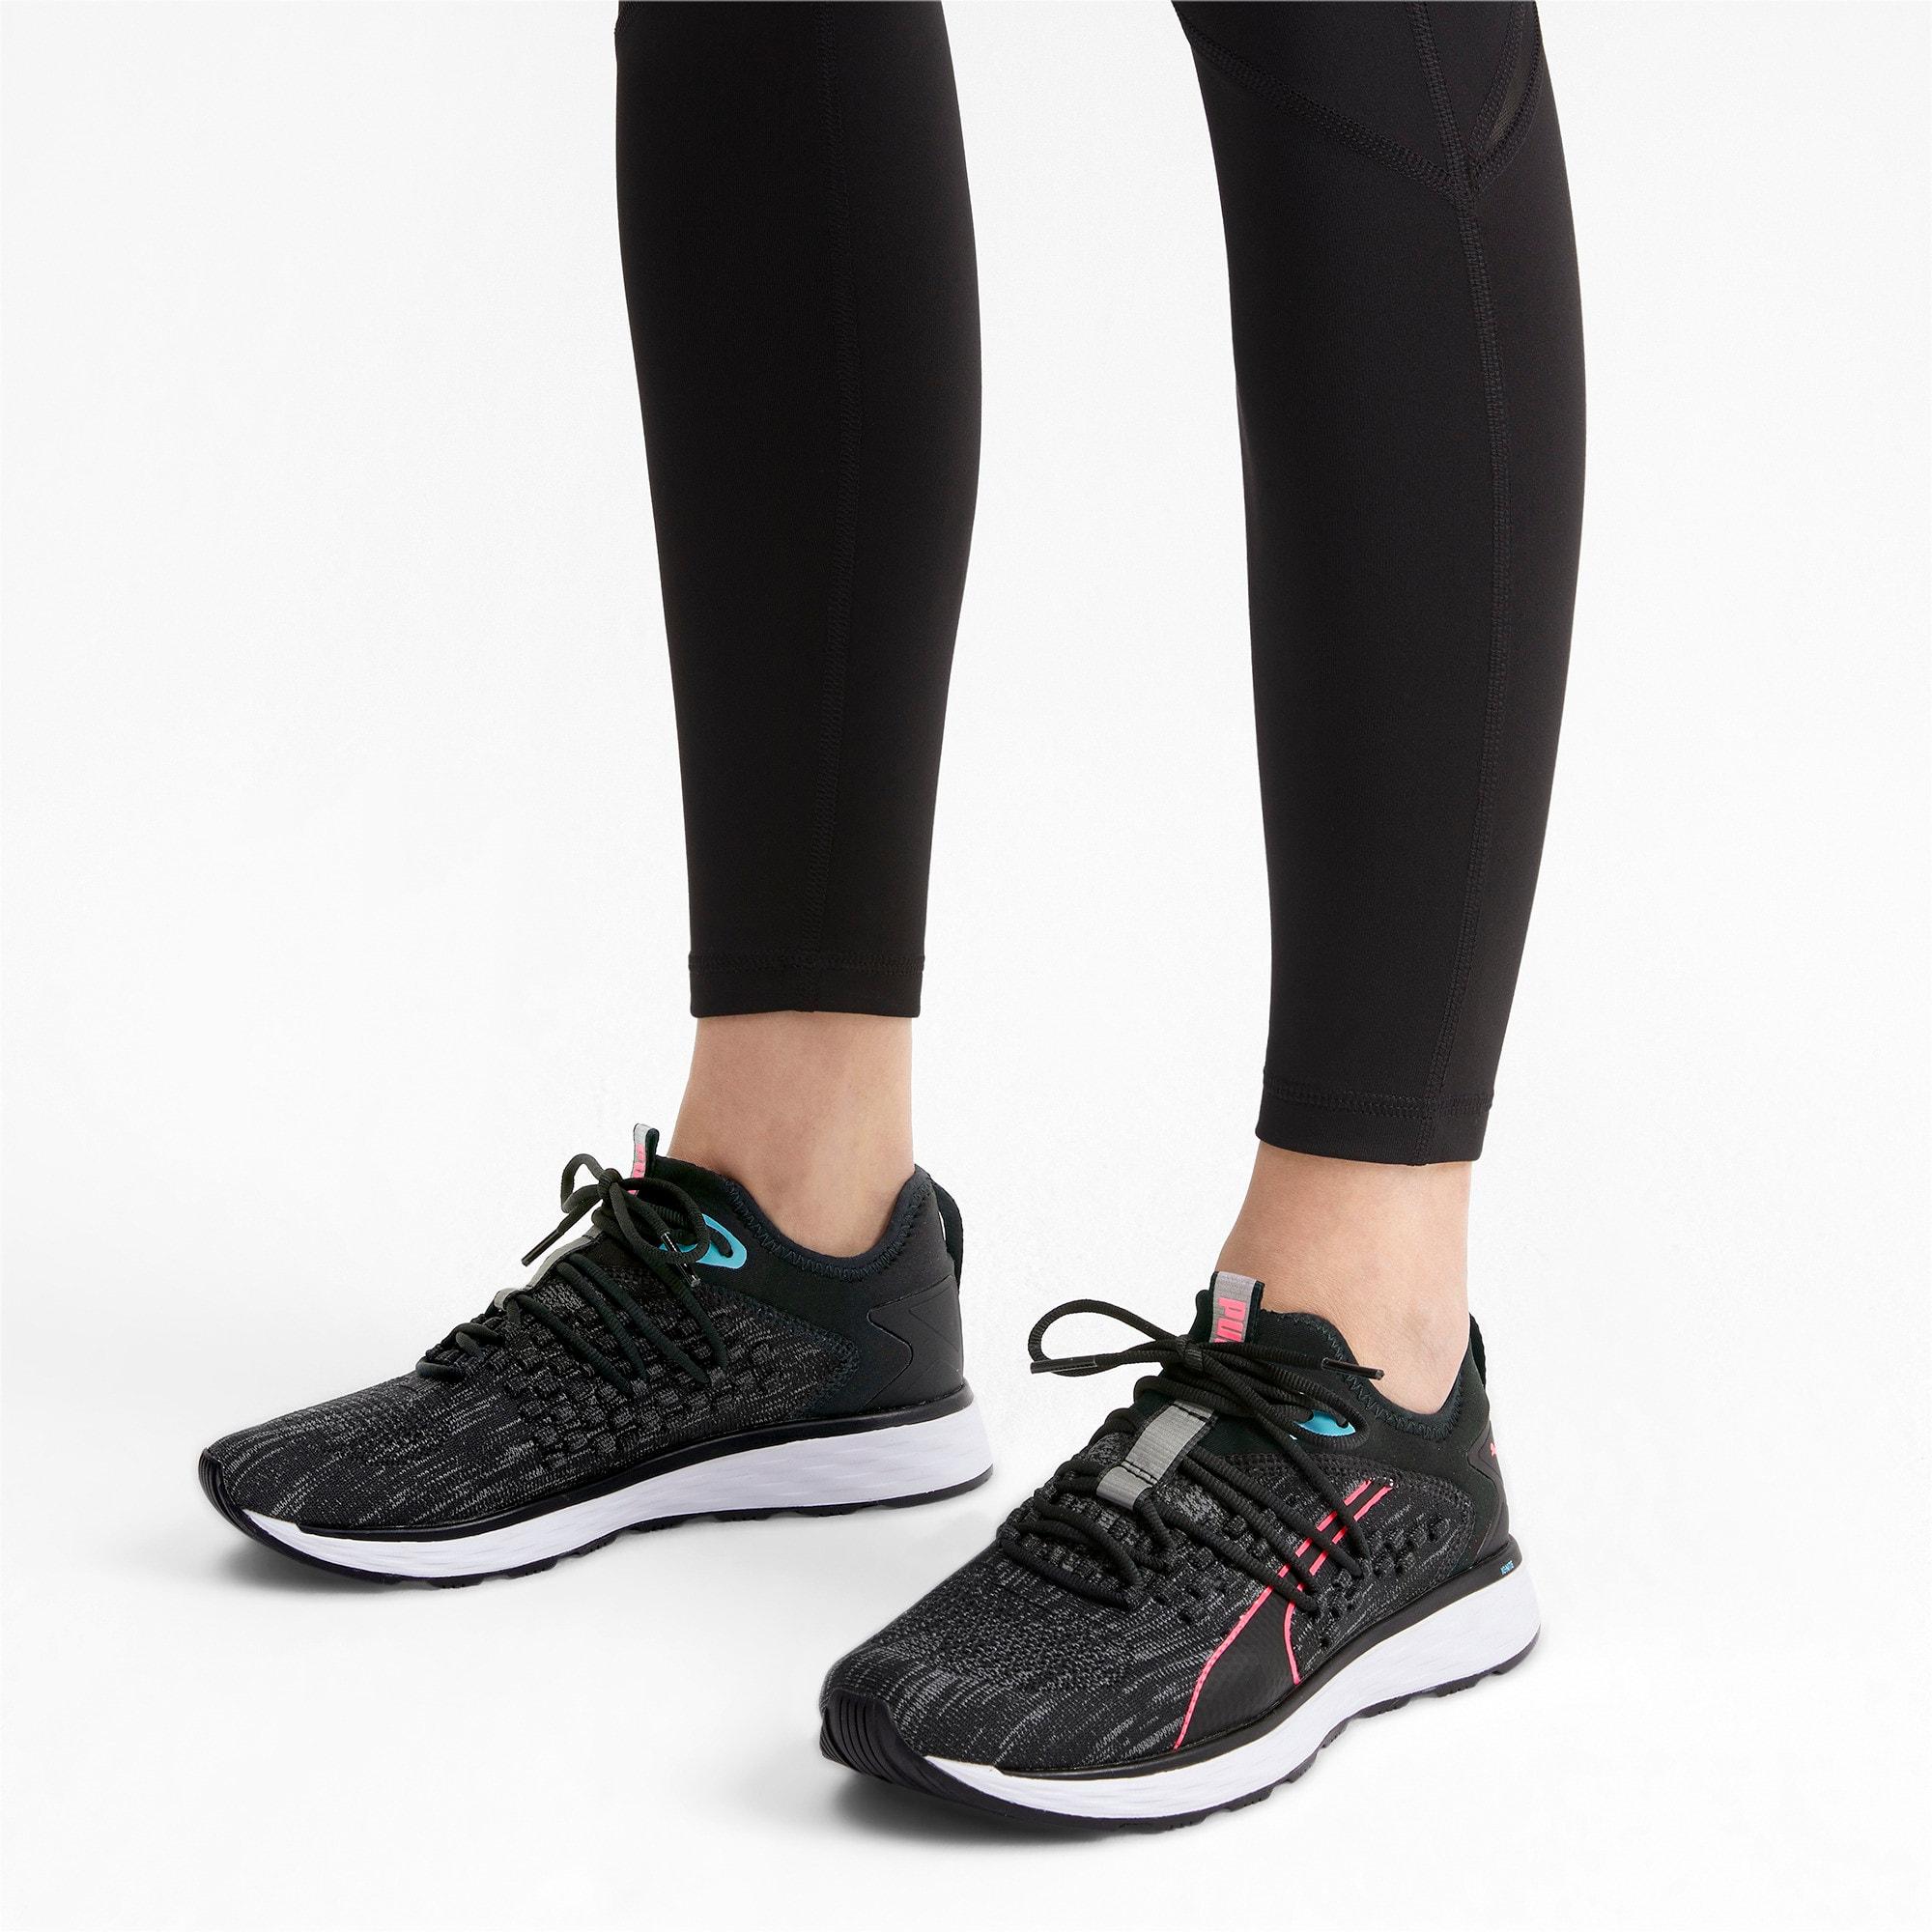 Thumbnail 2 of SPEED 600 FUSEFIT Women's Running Shoes, Puma Black-Milky Blue, medium